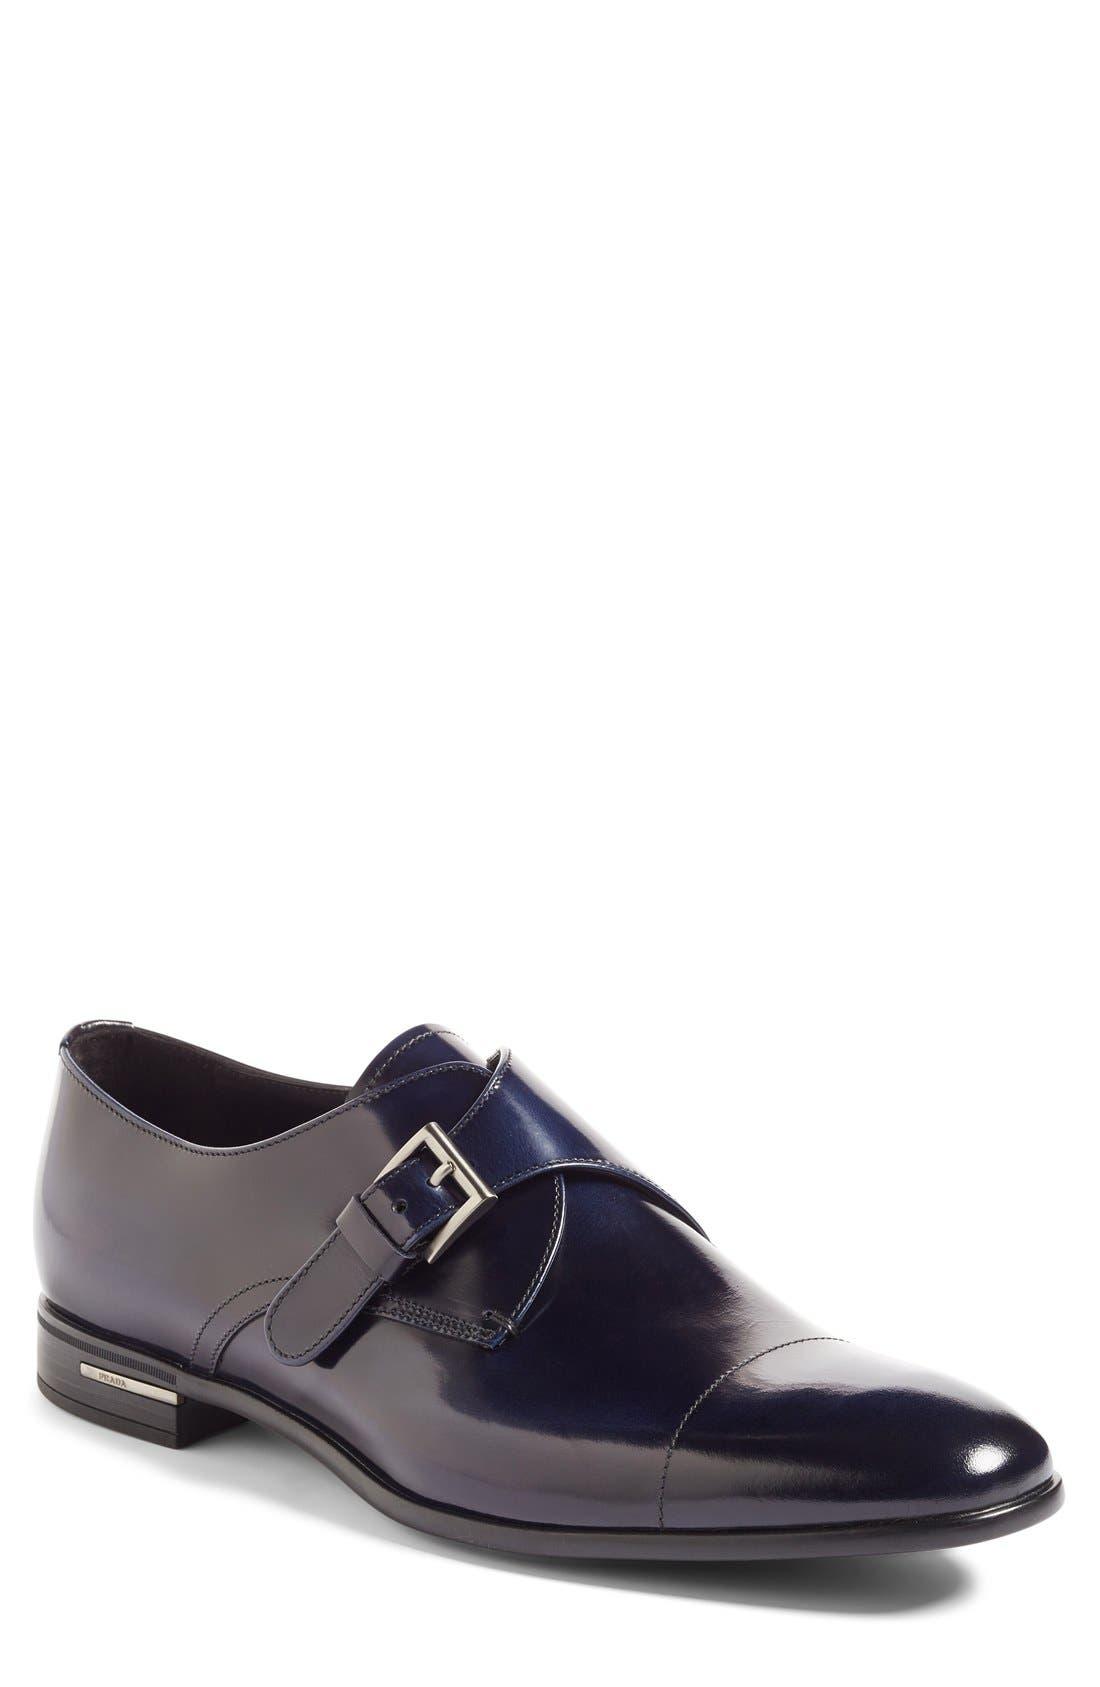 PRADA,                             Monk Strap Shoe,                             Main thumbnail 1, color,                             BLUE LEATHER